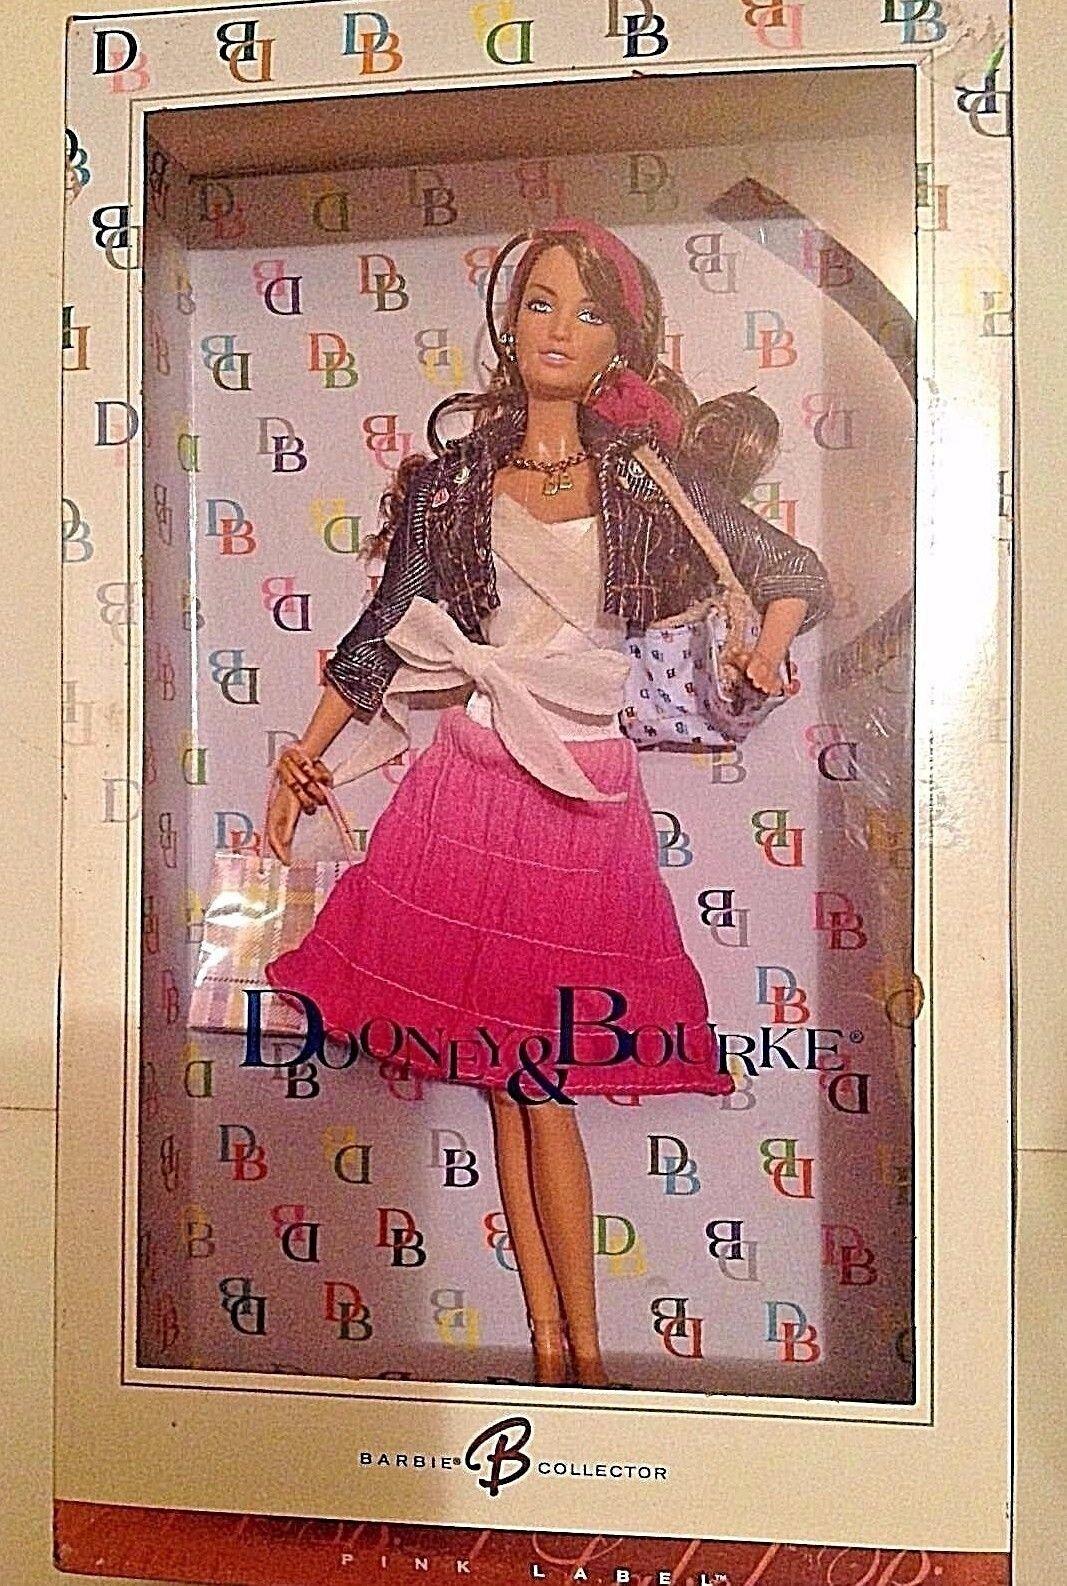 Nueva Muñeca Barbie Dooney & Bourke 2006 Duns Bolso rosado Etiqueta Ltd Edition retirado